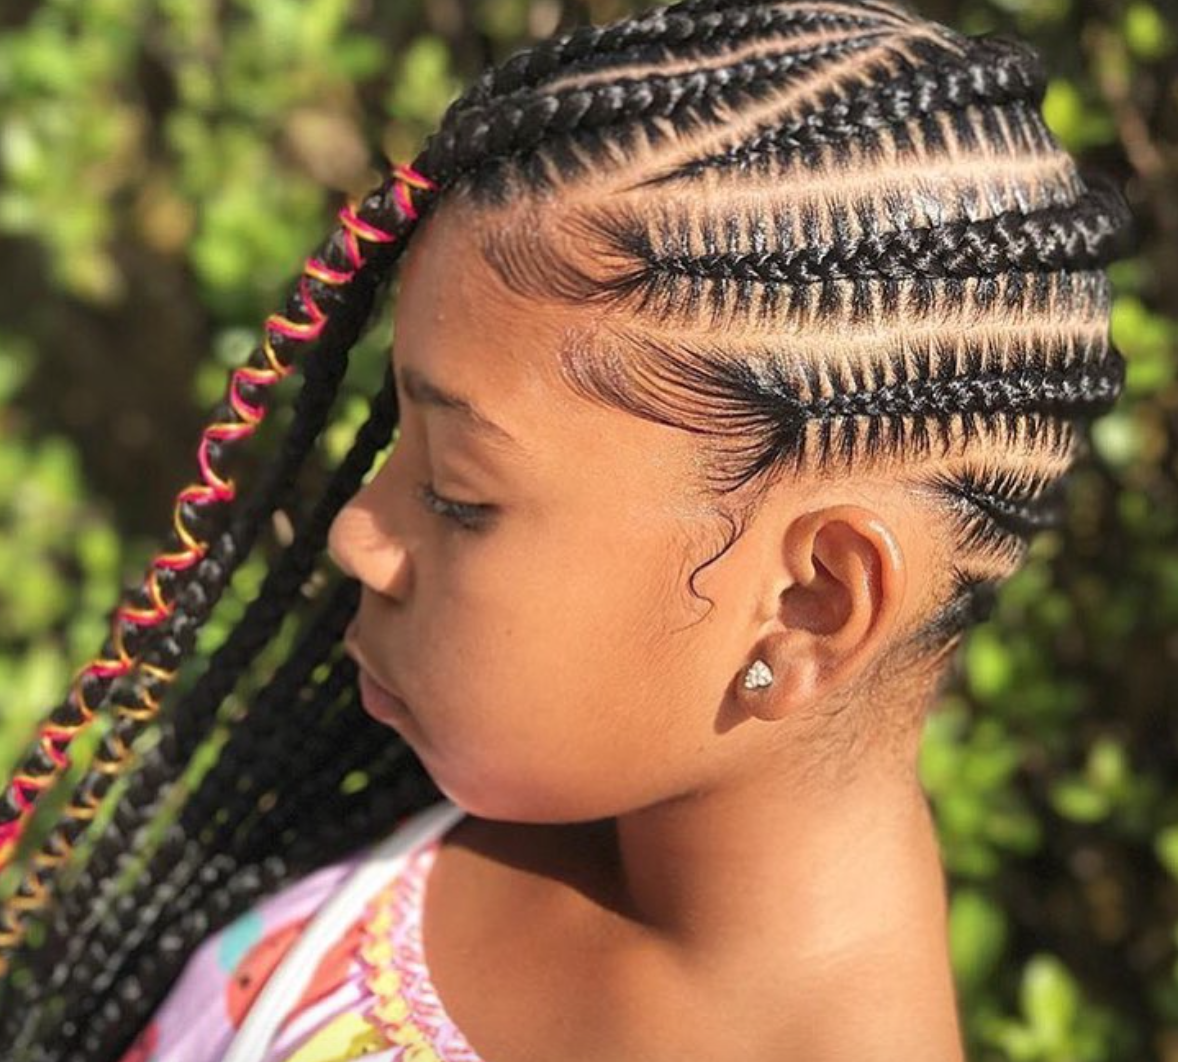 Sleek braids by @mslafitness - Black Hair Information